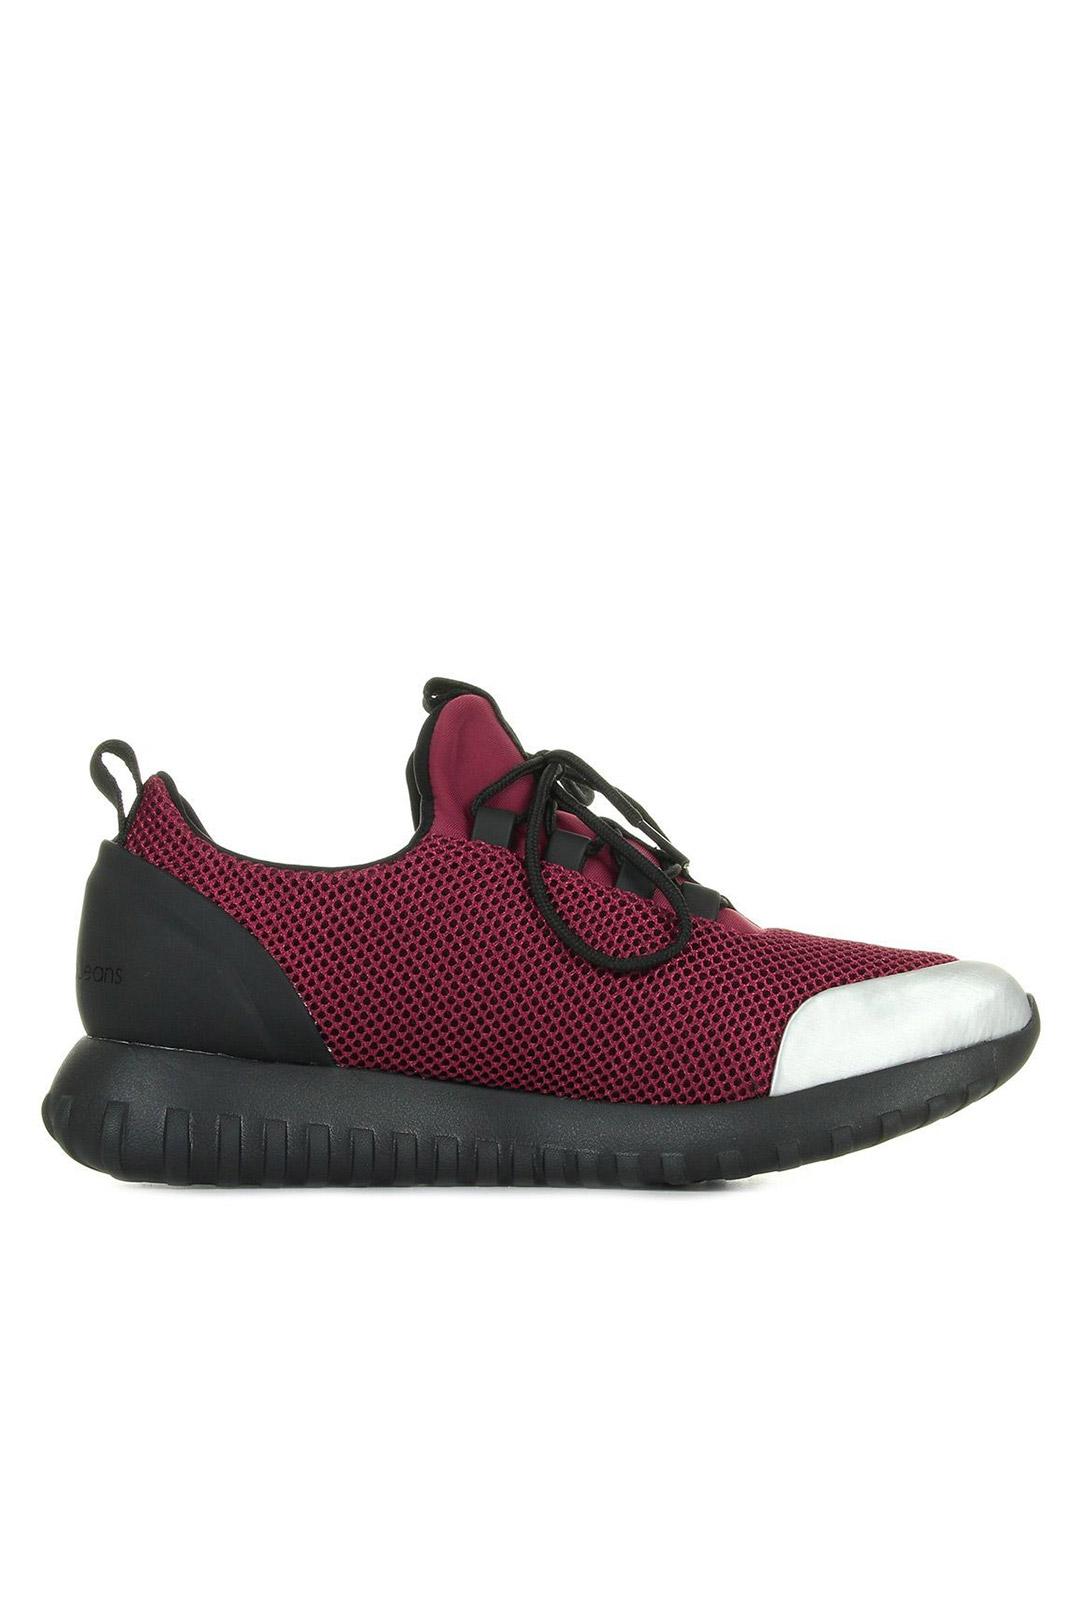 Baskets / Sneakers  Calvin klein REIKA BERRY/SILVER